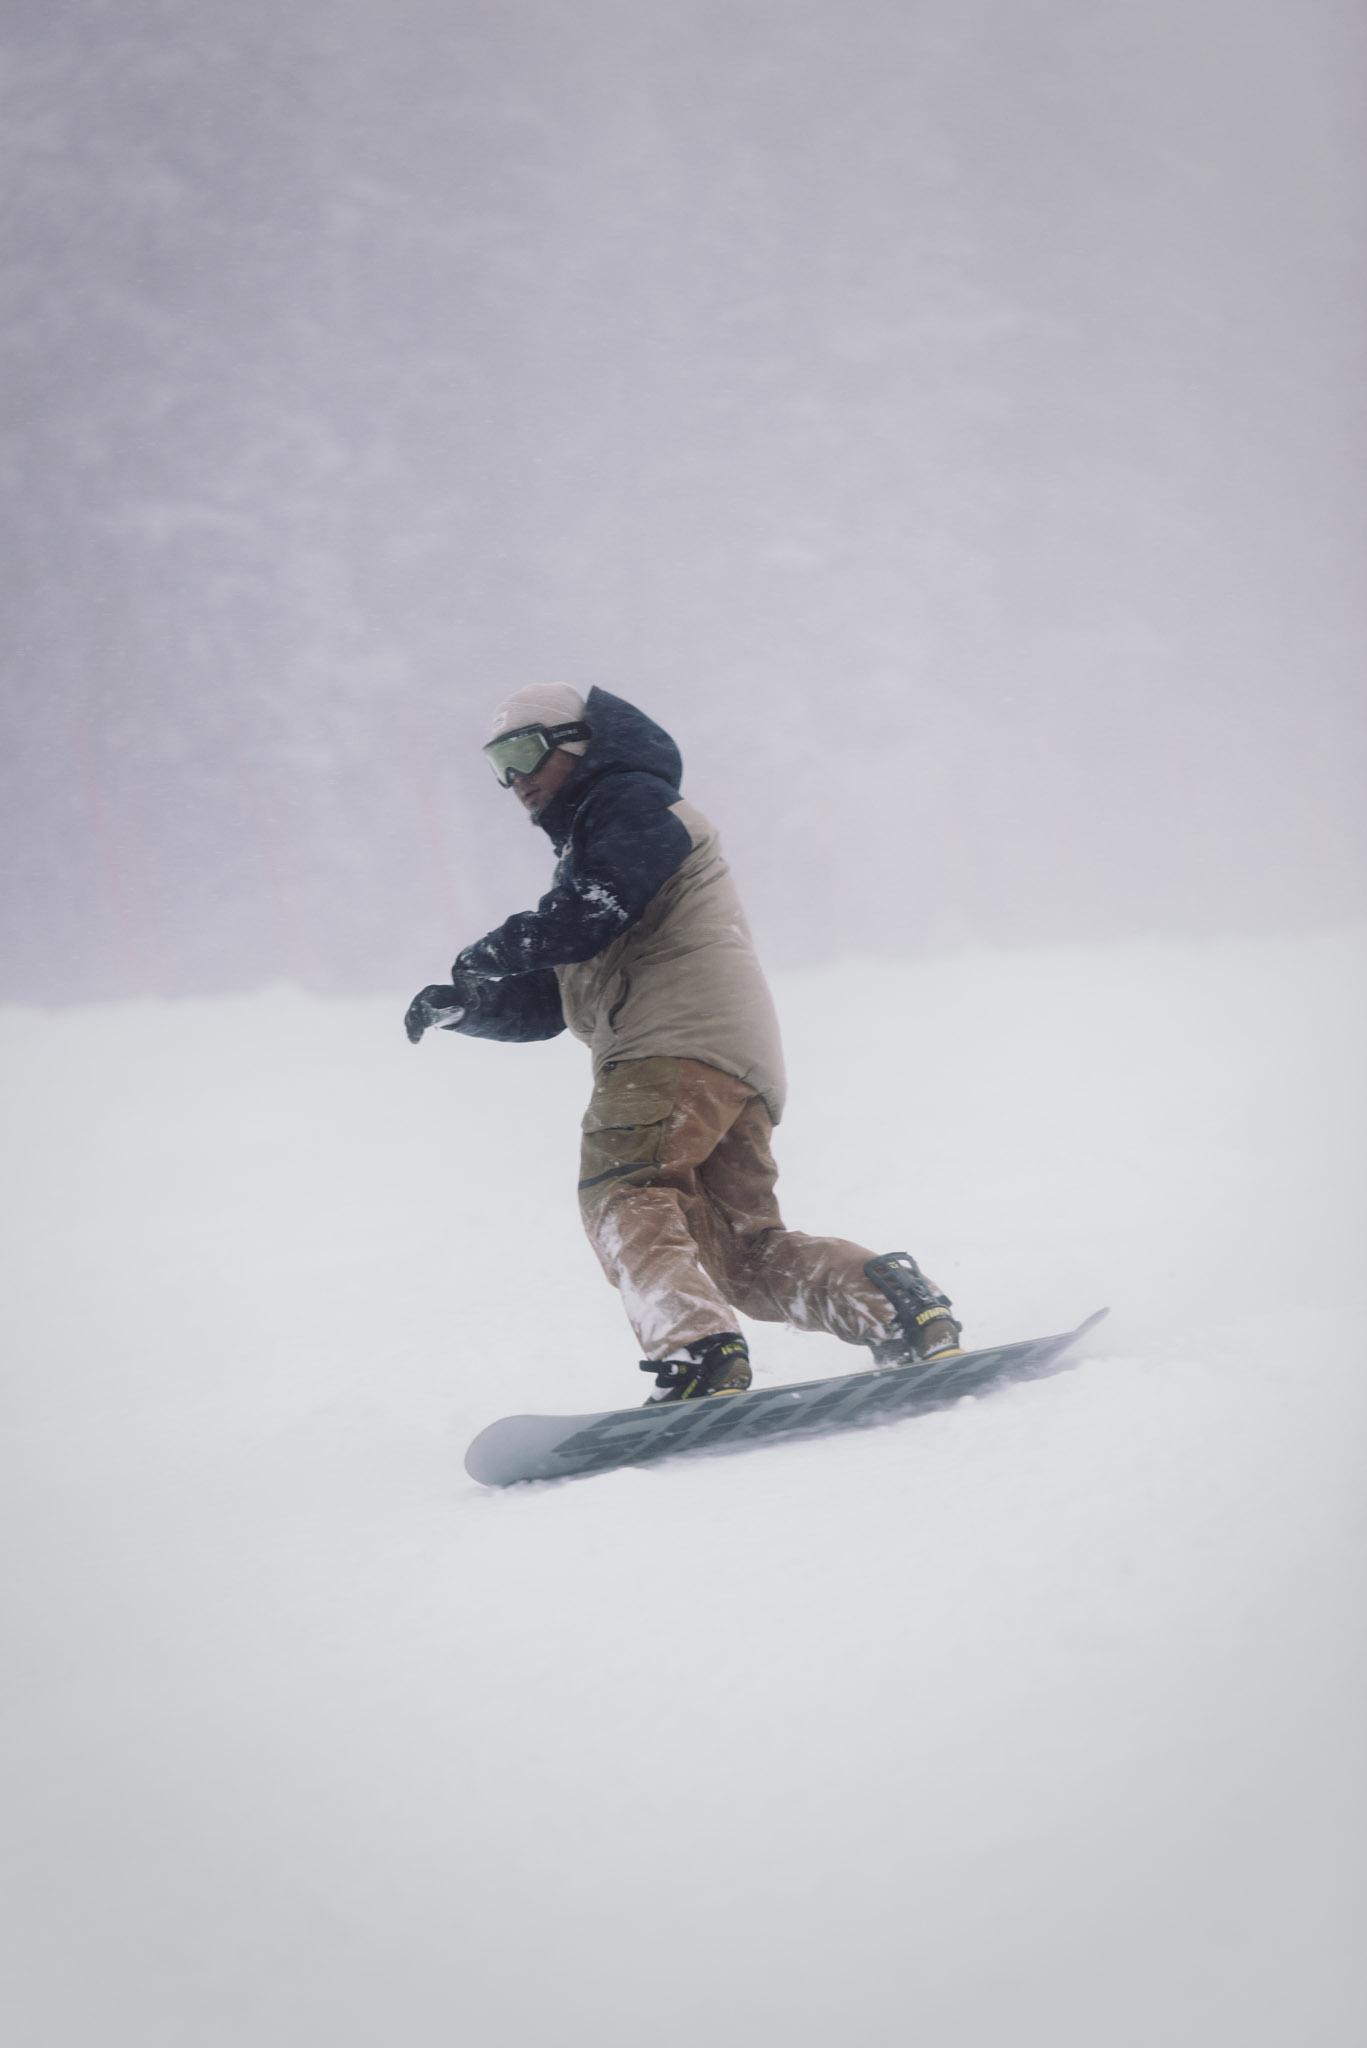 Chelsea Czibere - January 19, 2018 - Nakiska Ski Resort-37.jpg